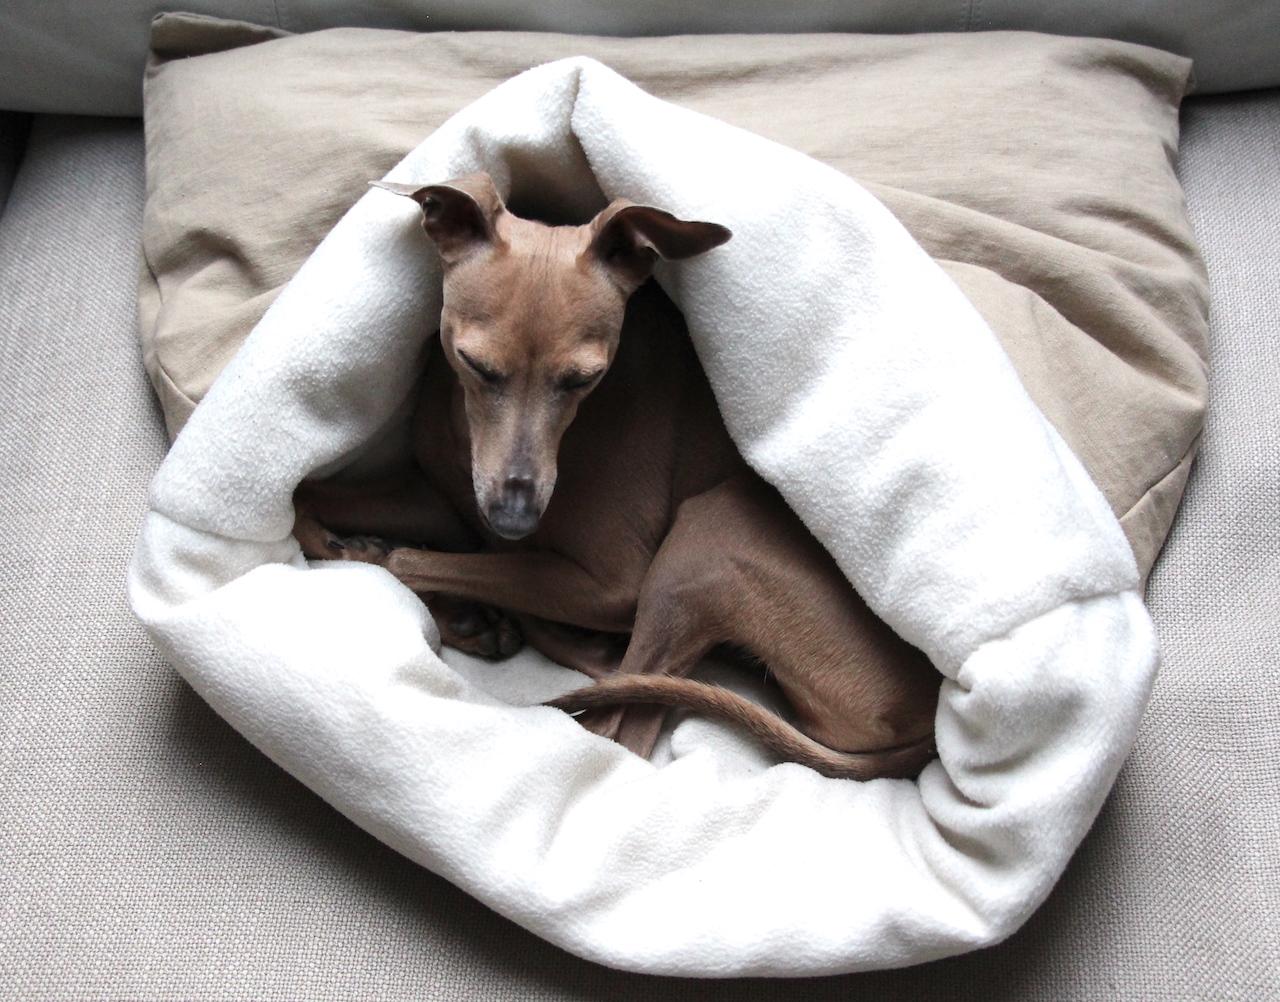 Monatspfoto Gemütlichkeit Hundeblog miDoggy